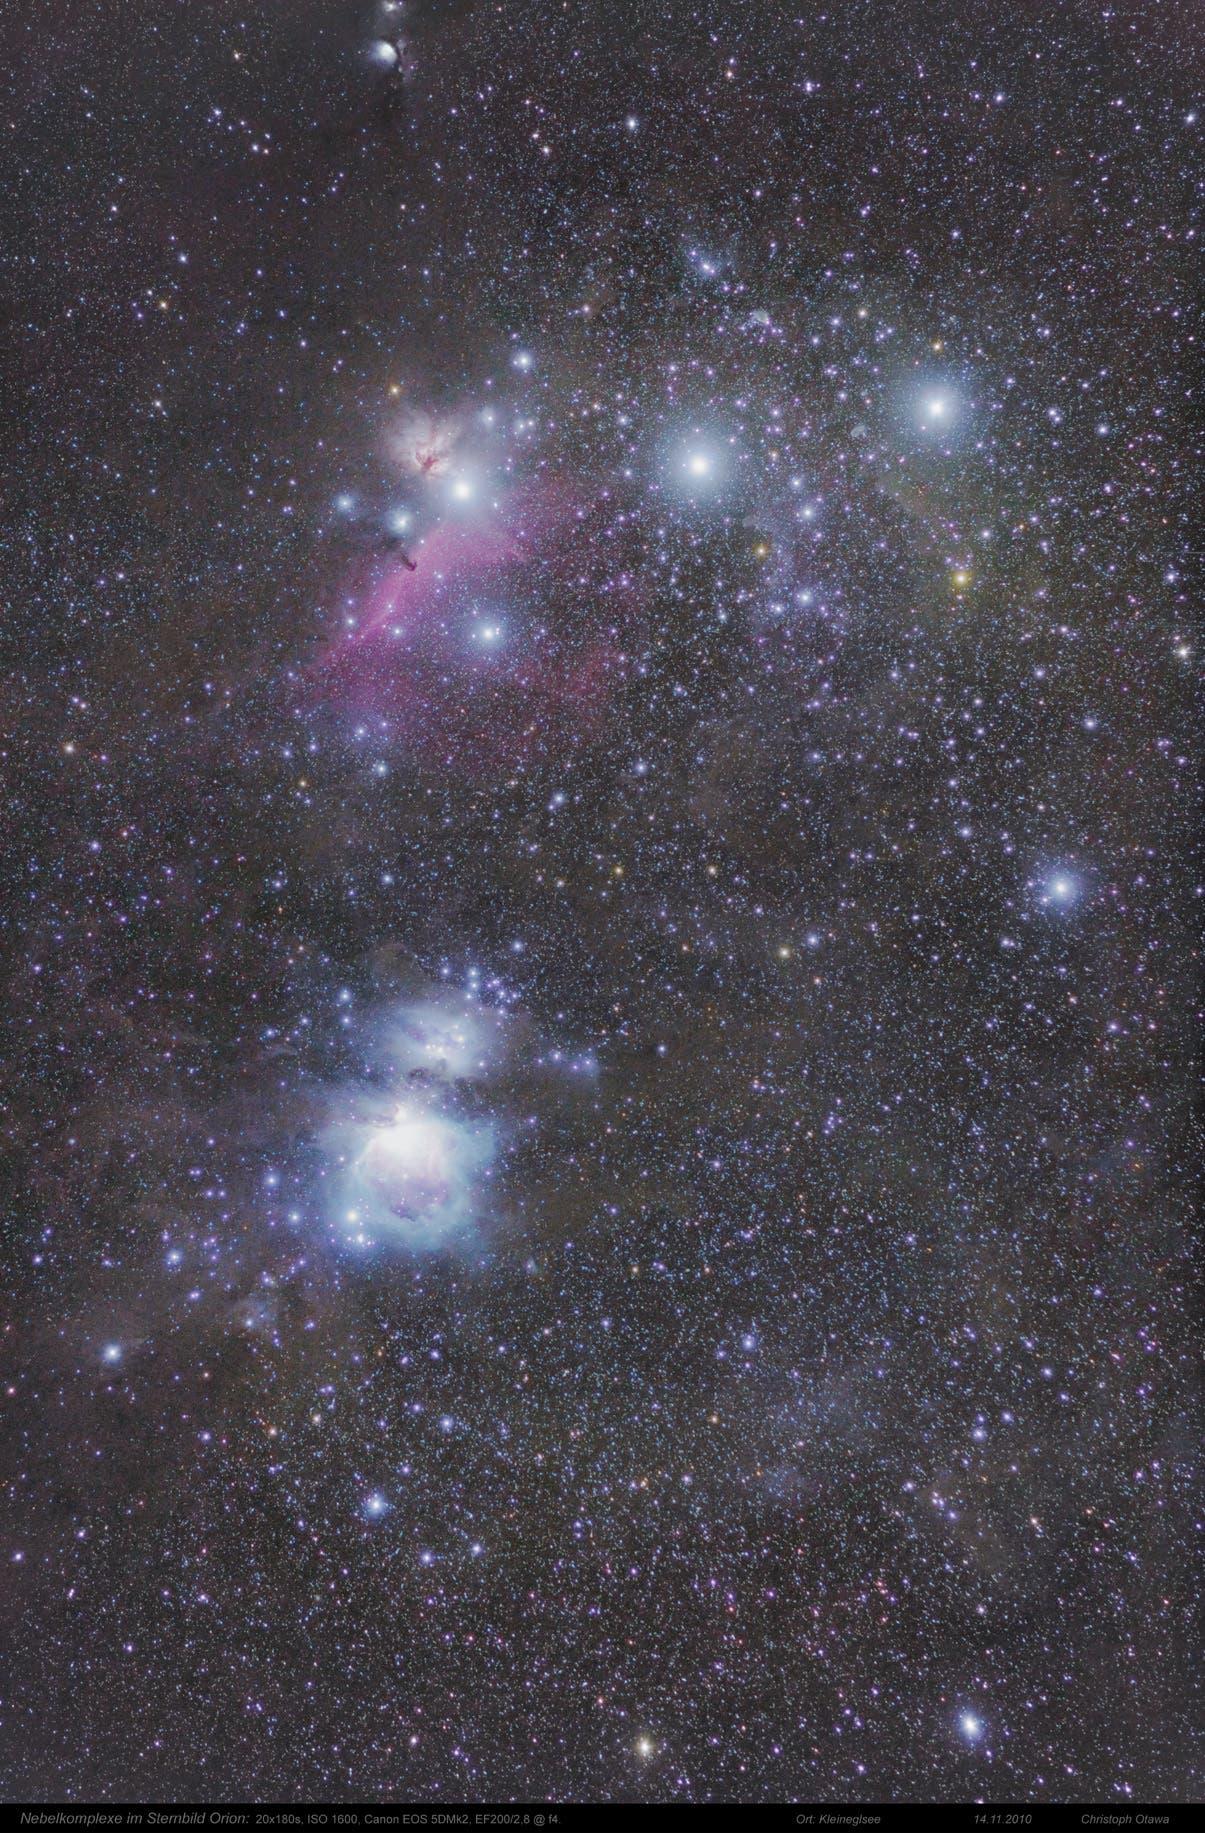 Nebelkomplexe im Orion